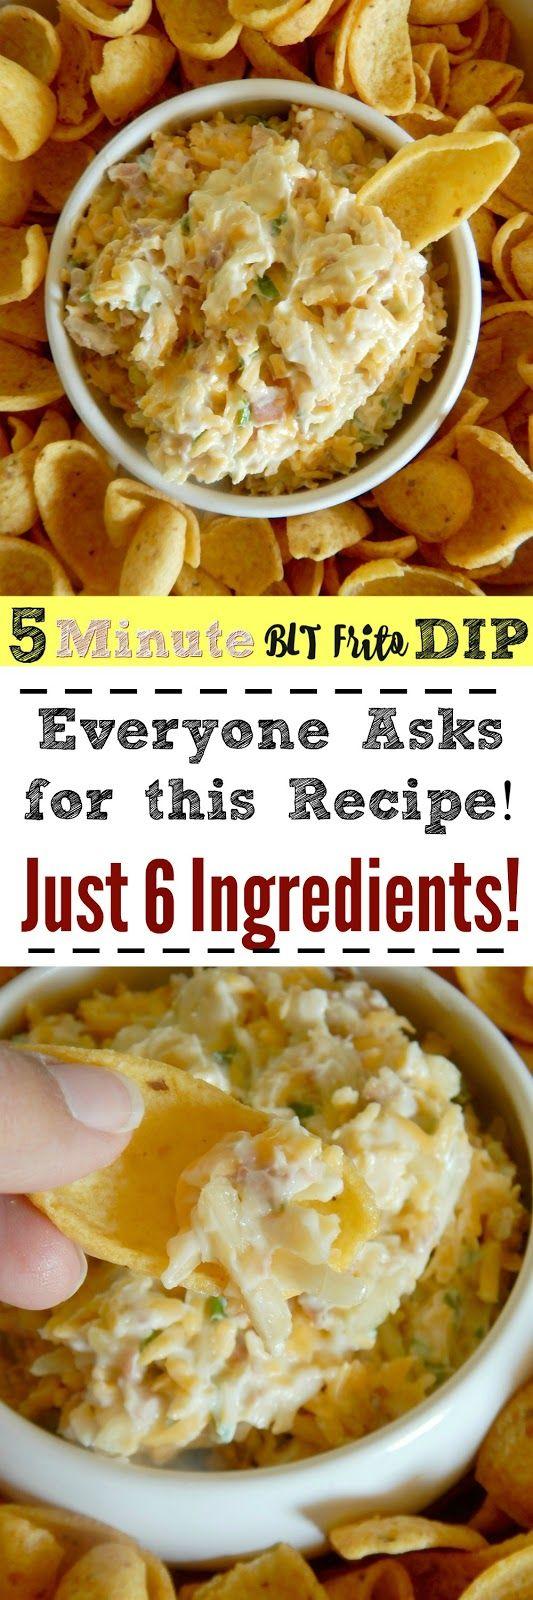 5 Minute BLT Frito Dip